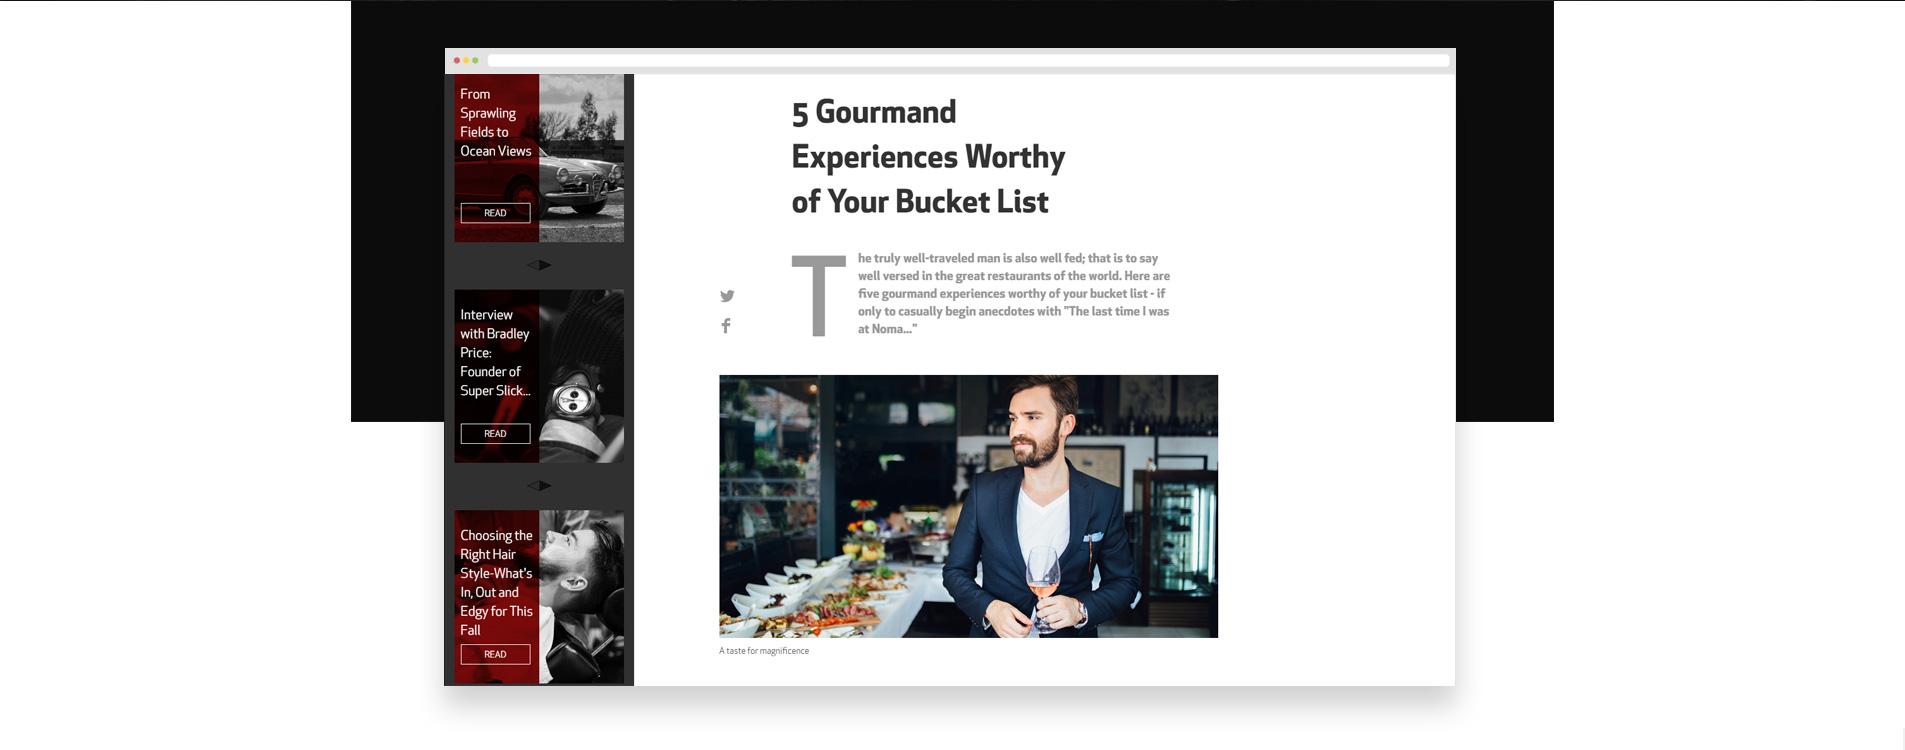 alfa-romeo-article-layout